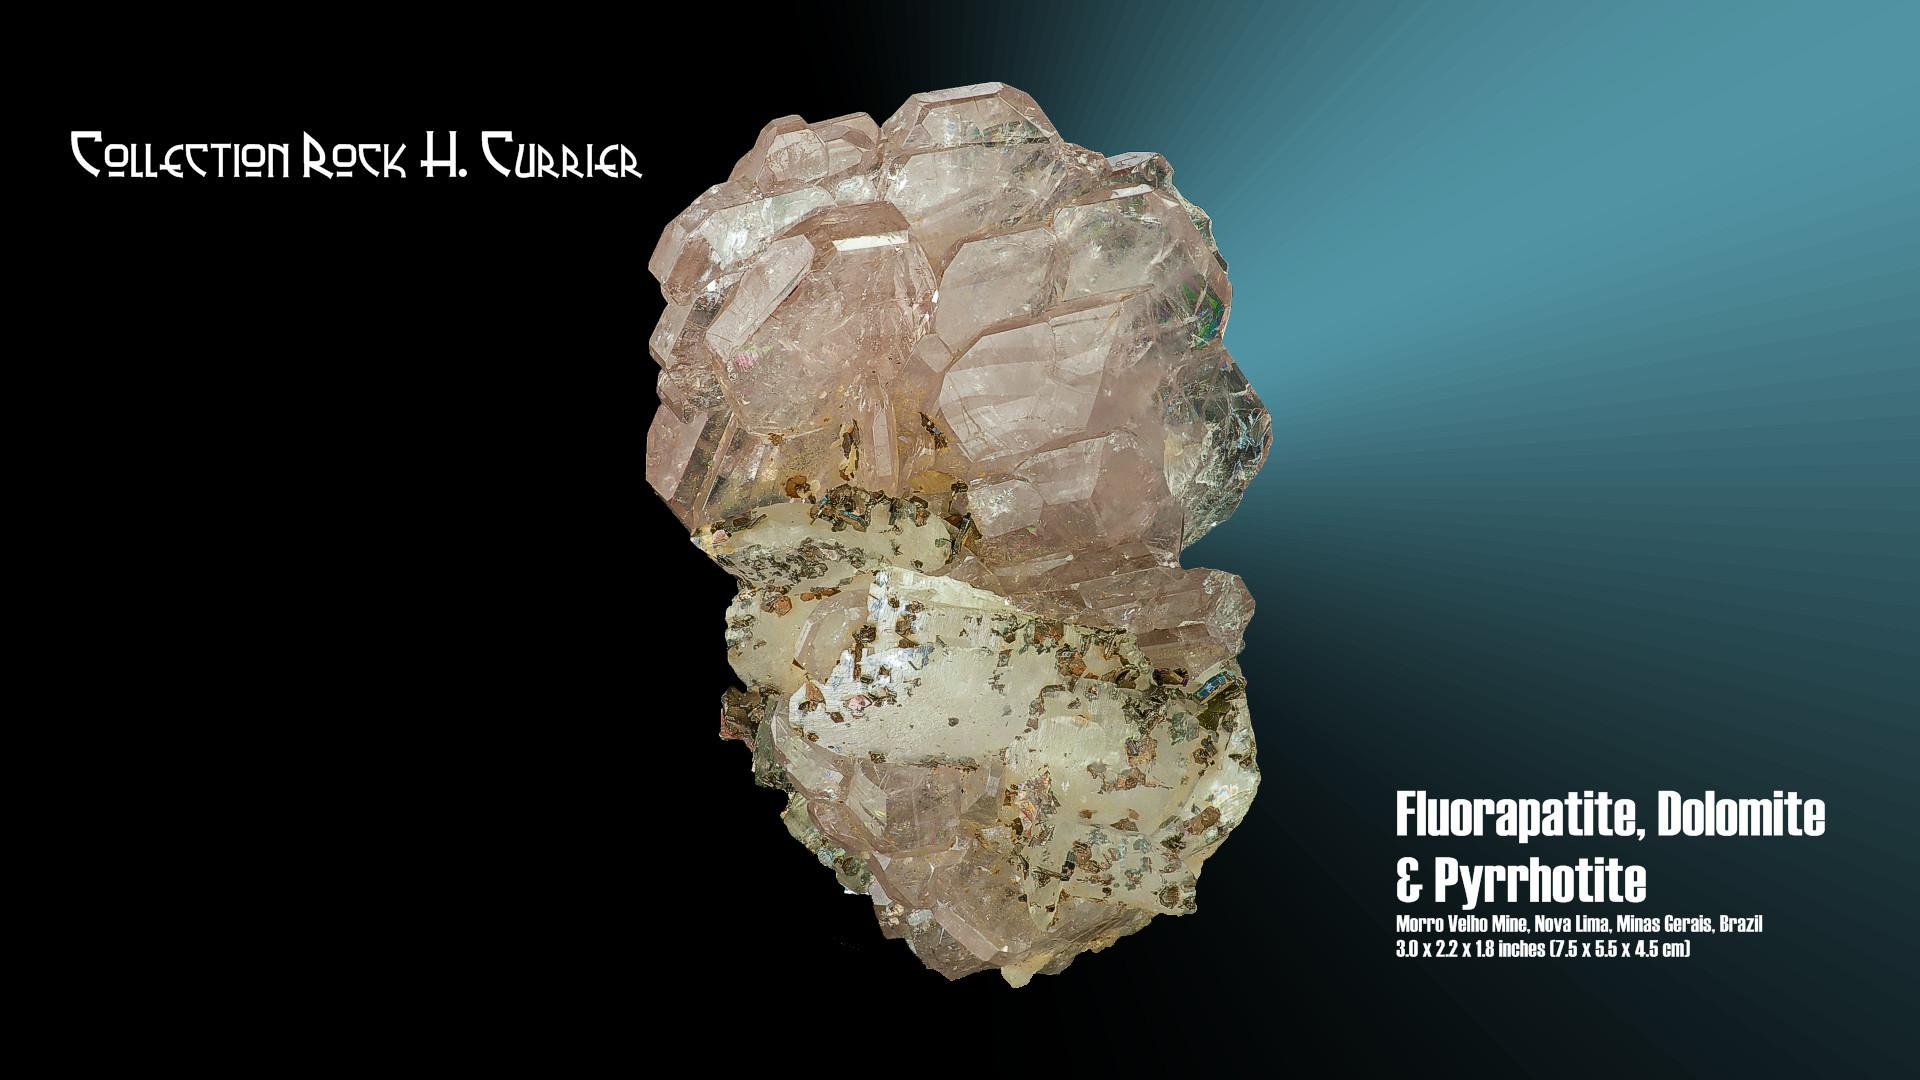 Fluorapatite, Dolomite & Pyrrhotite.jpg